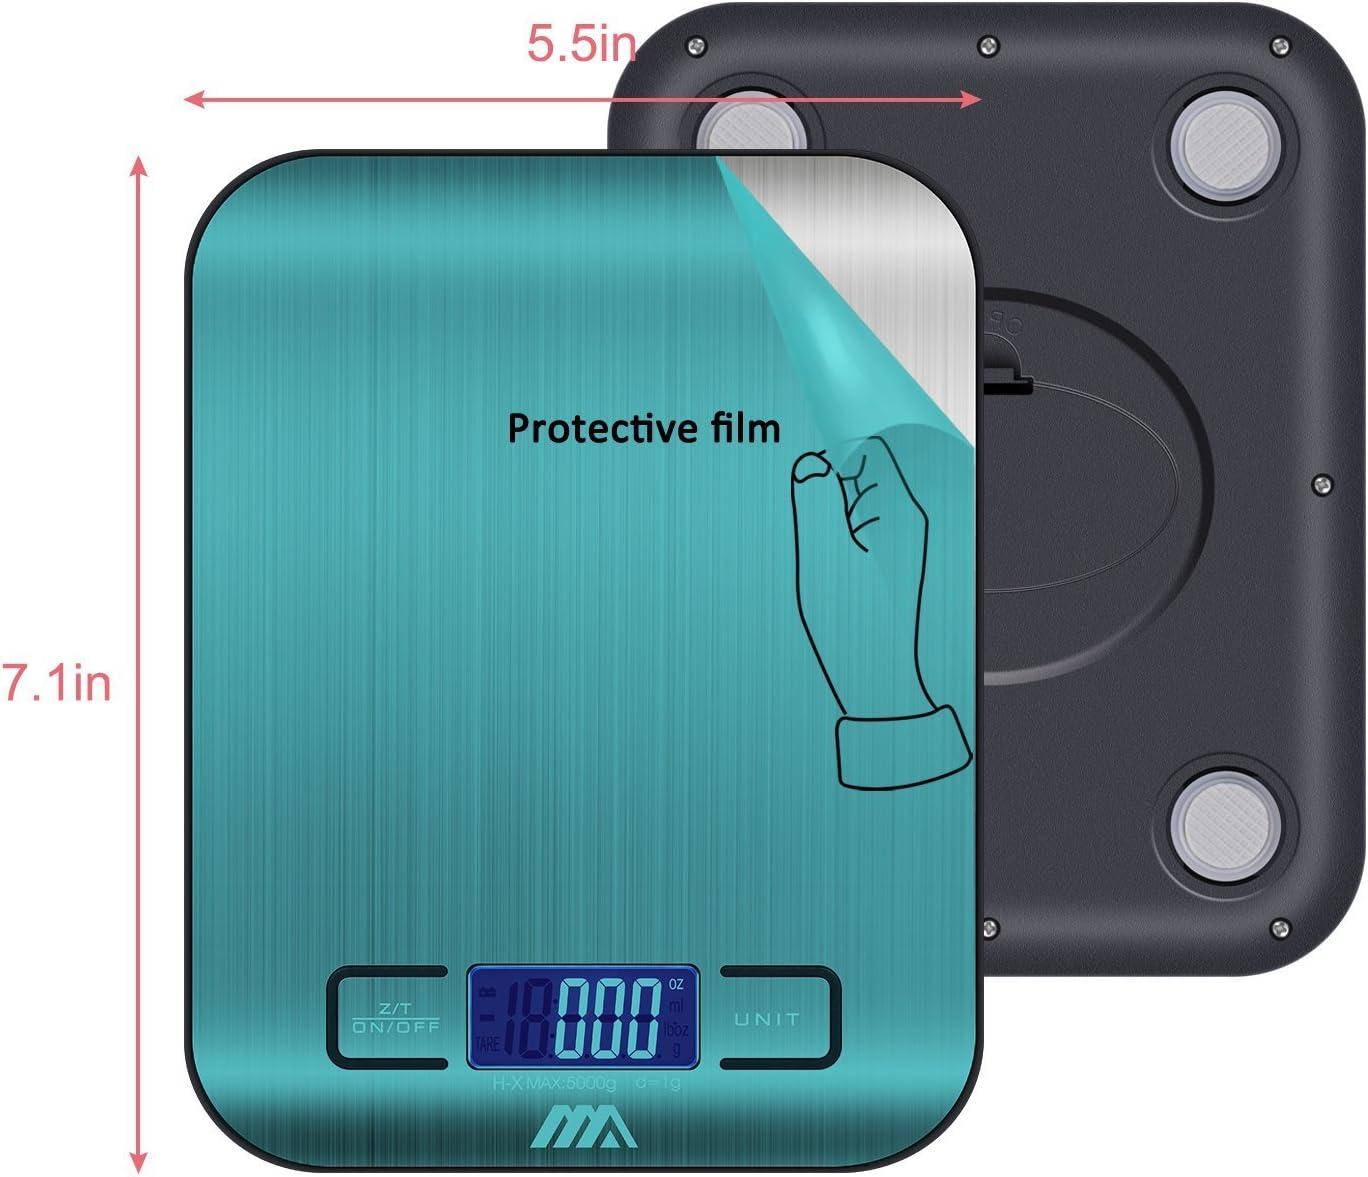 Color Plateado Joyer/ía y M/ás Mini Balanza Escala Multifuncional electr/ónica para Alimentaci/ón Smart Weigh Adoric B/áscula digital Cocina